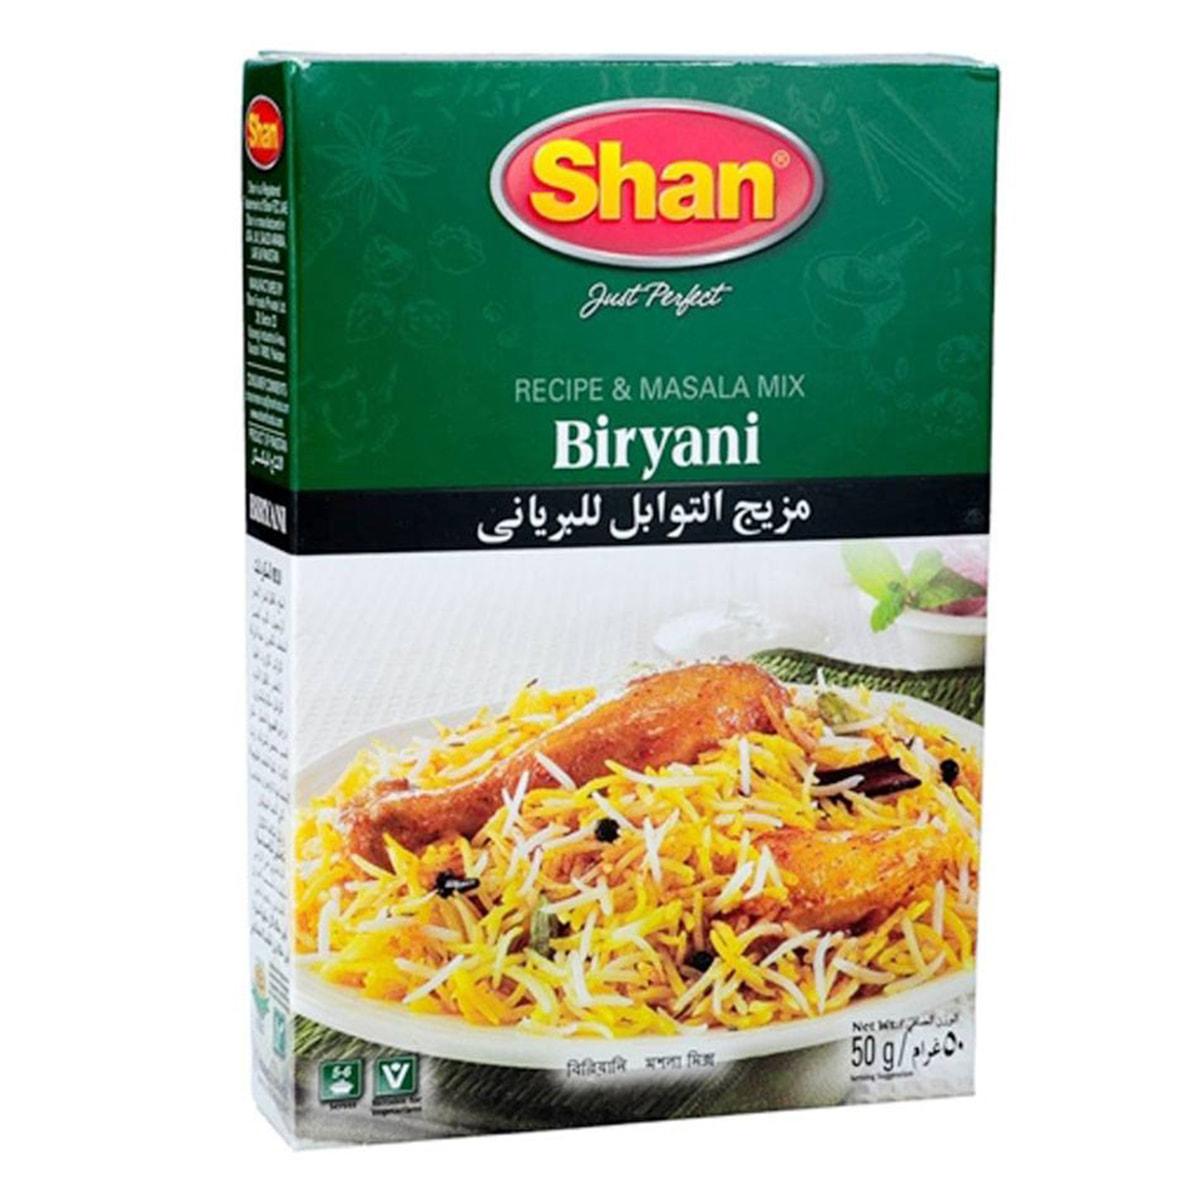 Buy Shan Biryani Masala Mix - 50 gm